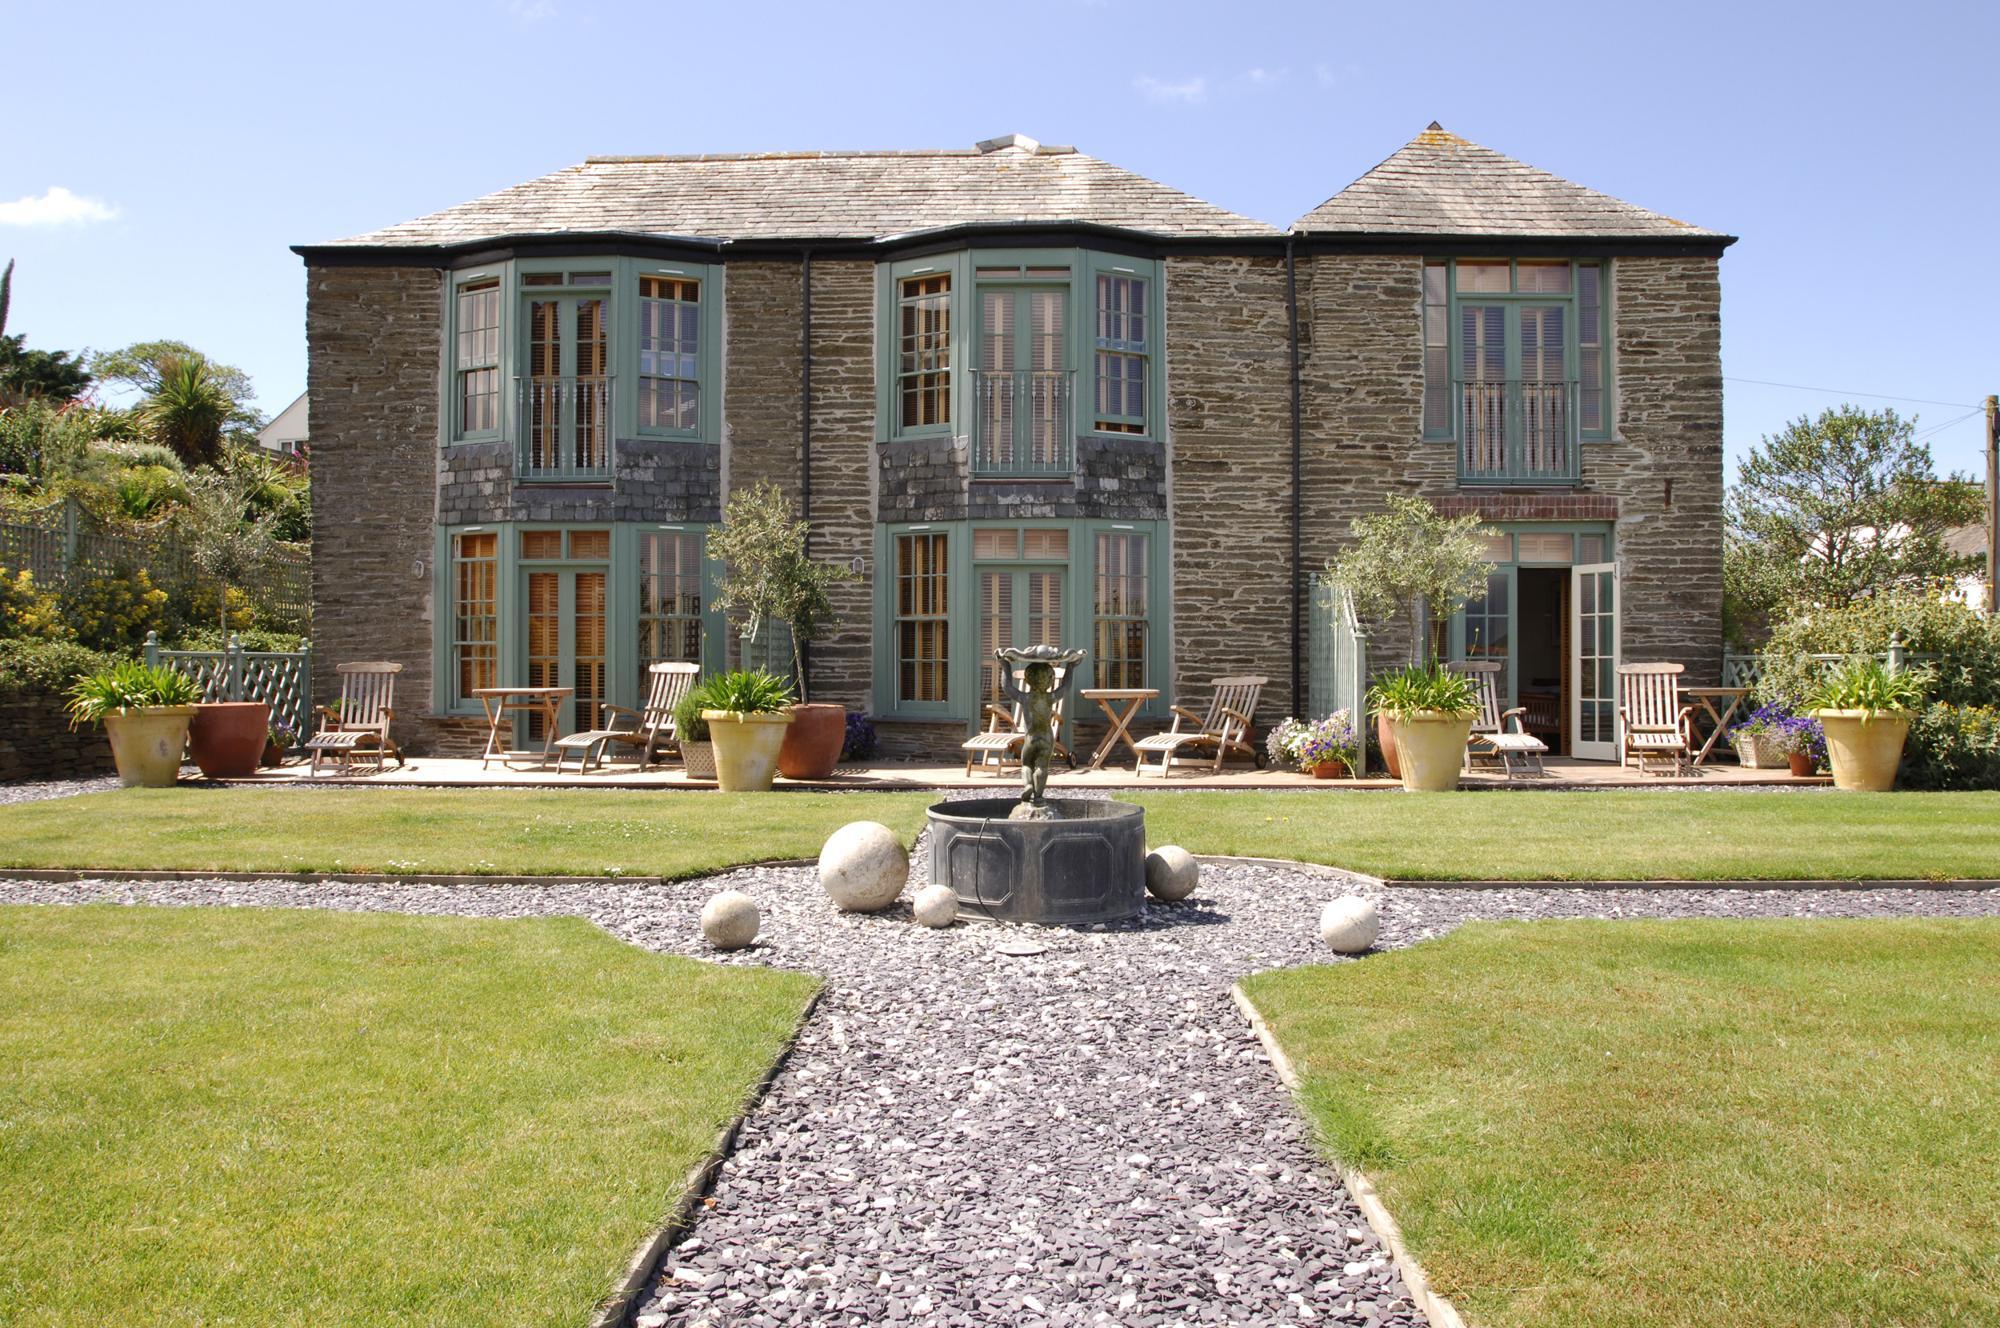 St Edmund's House